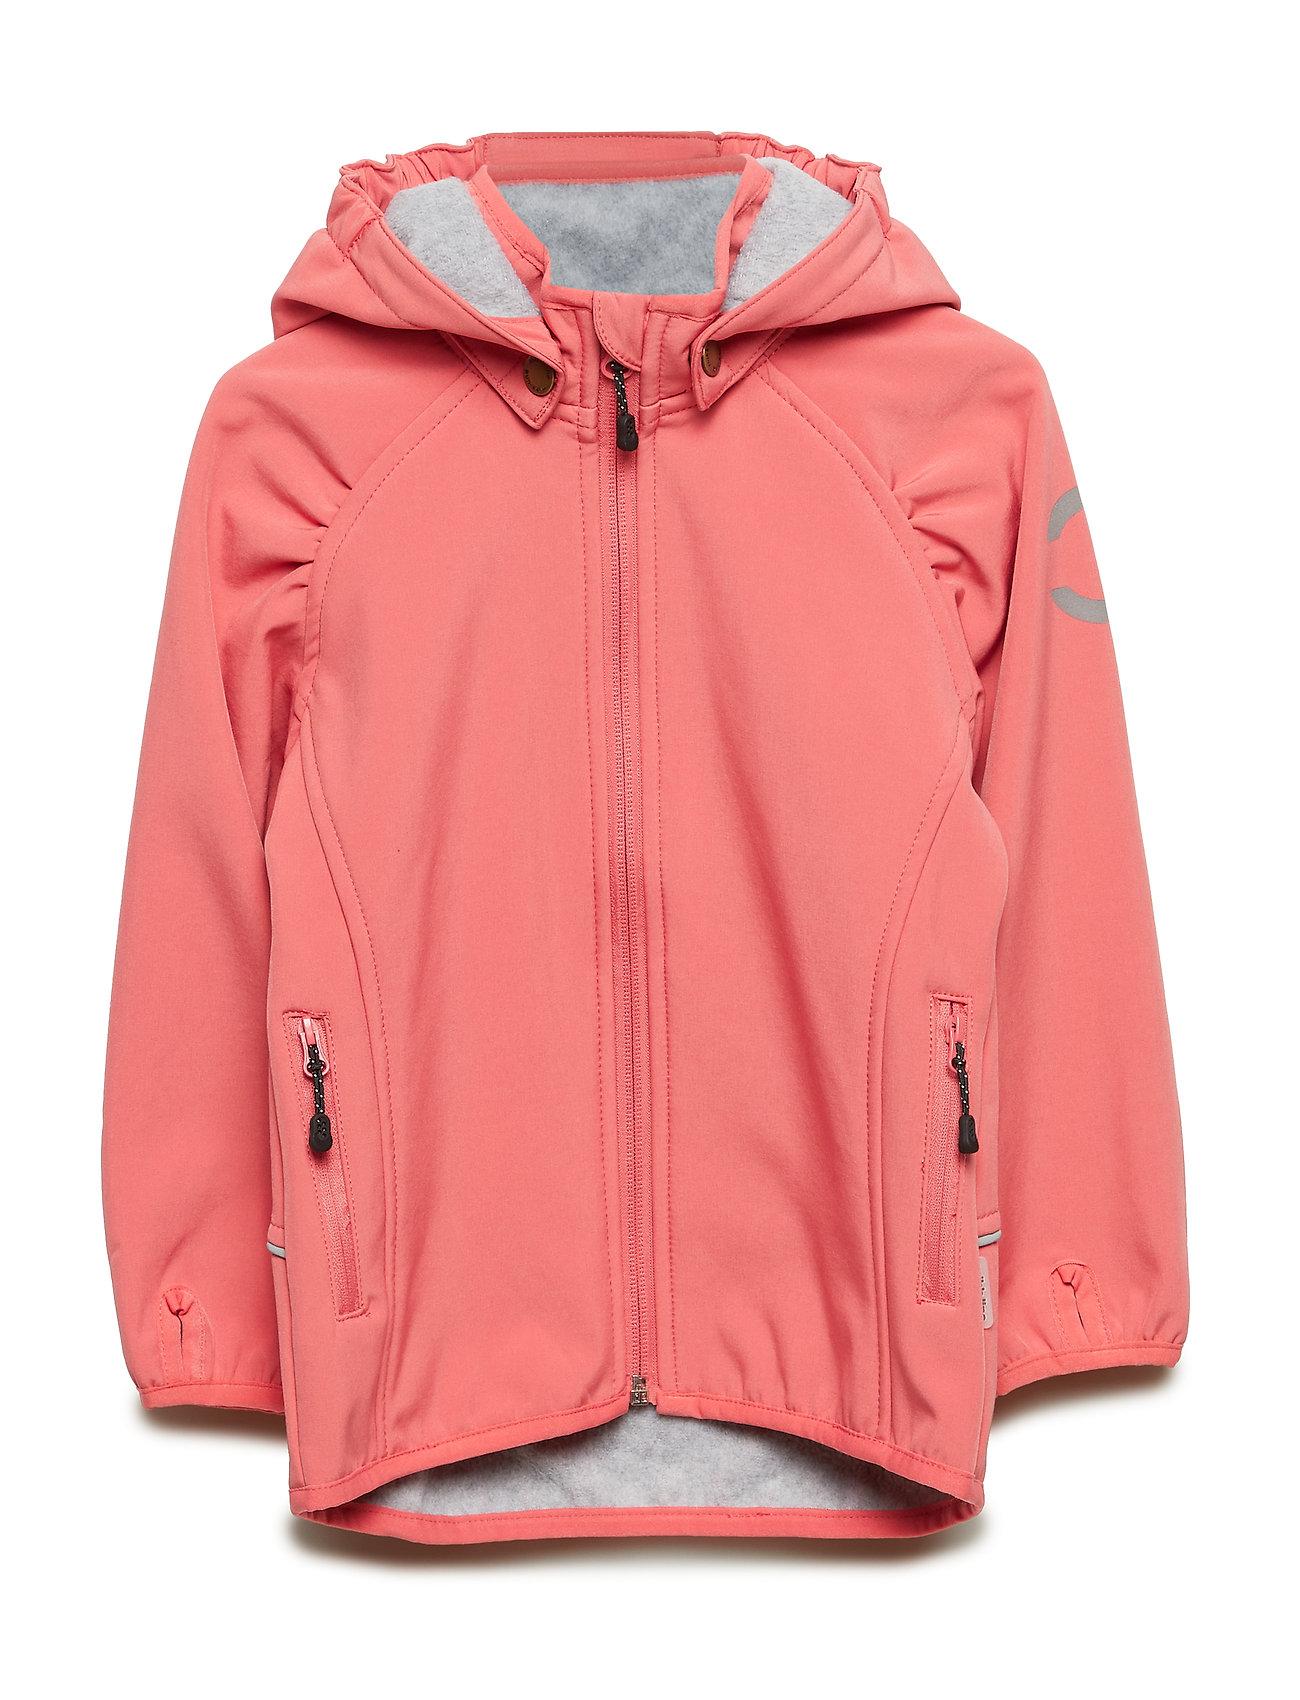 Mikk-Line SOFTSHELL Girls Jacket - TEA ROSE